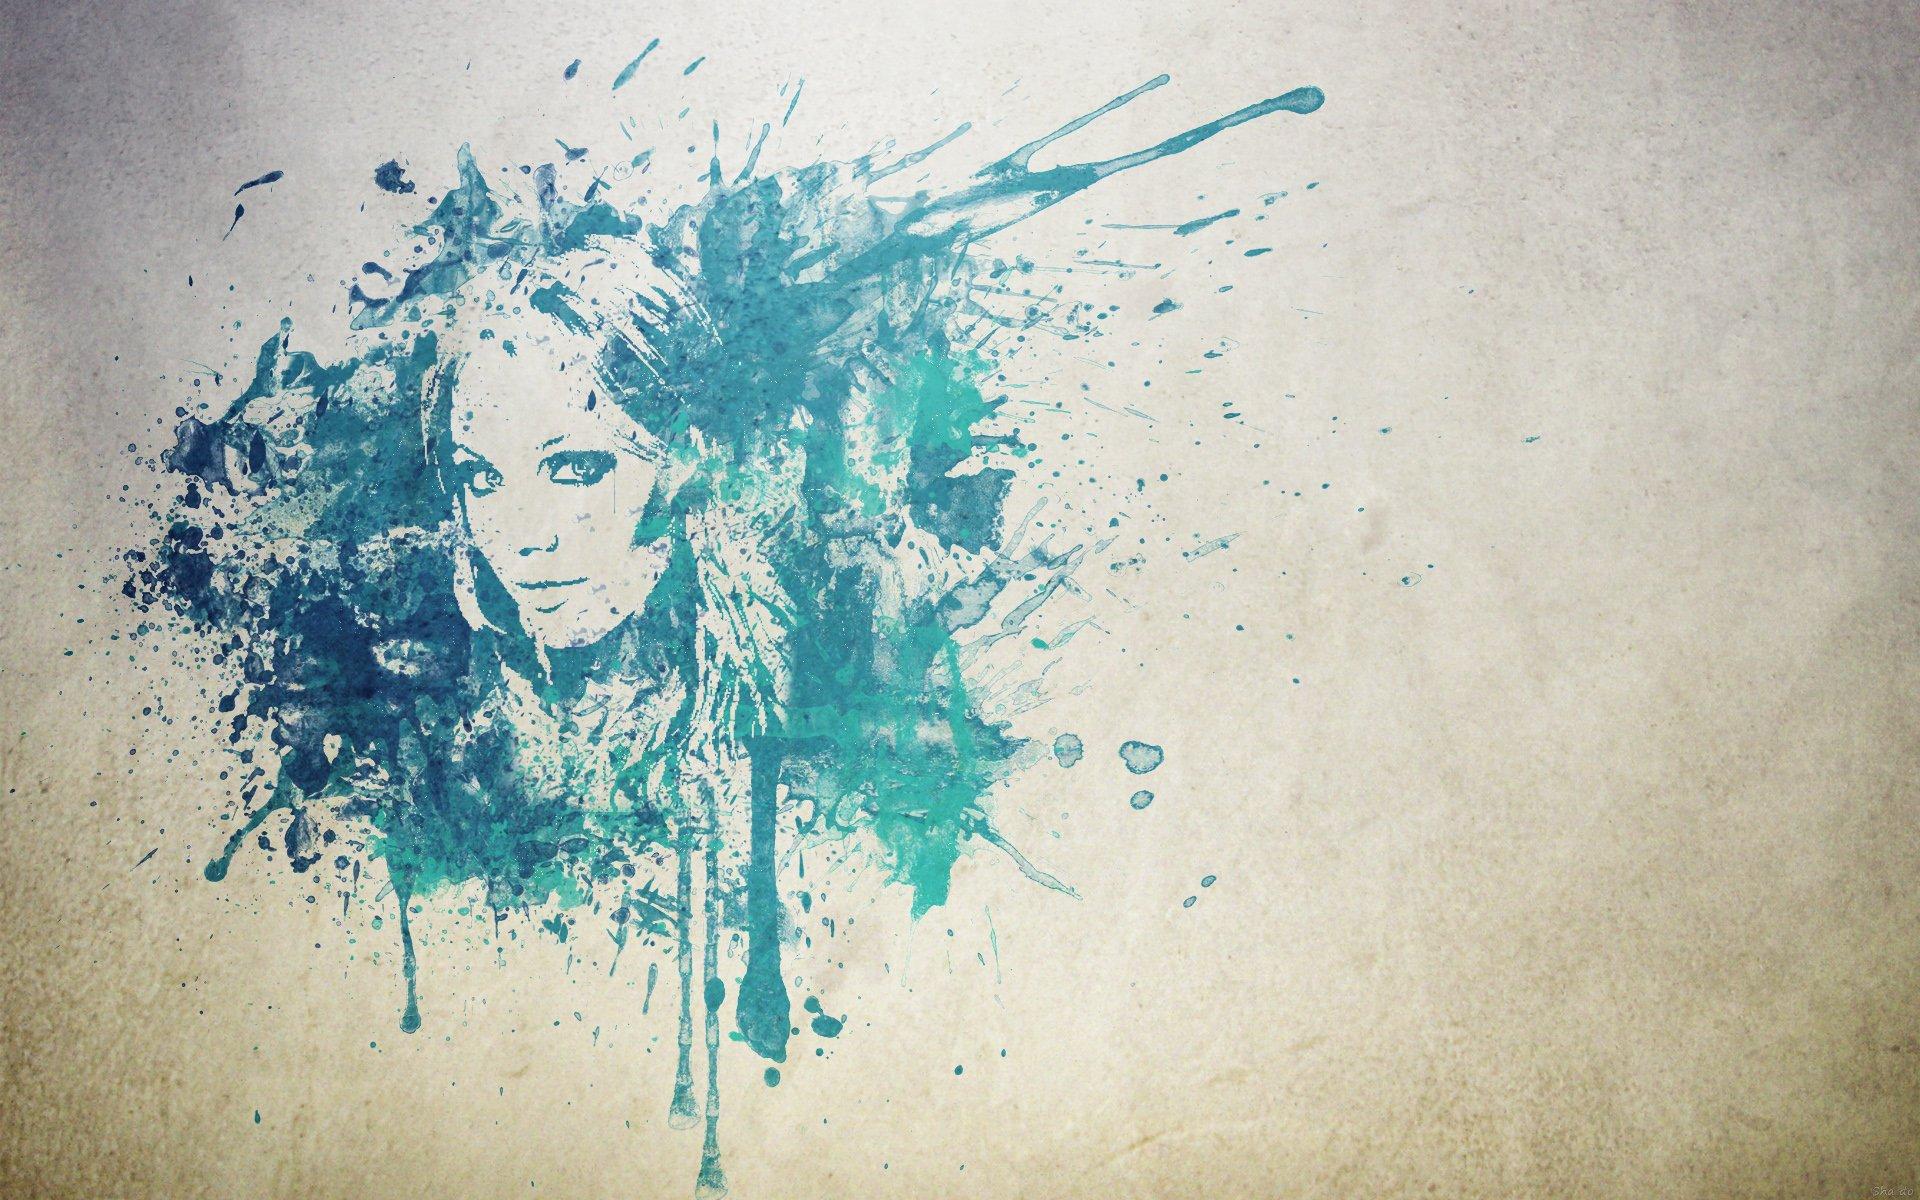 Wallpapers Digital Art Compositions 2D Splash !